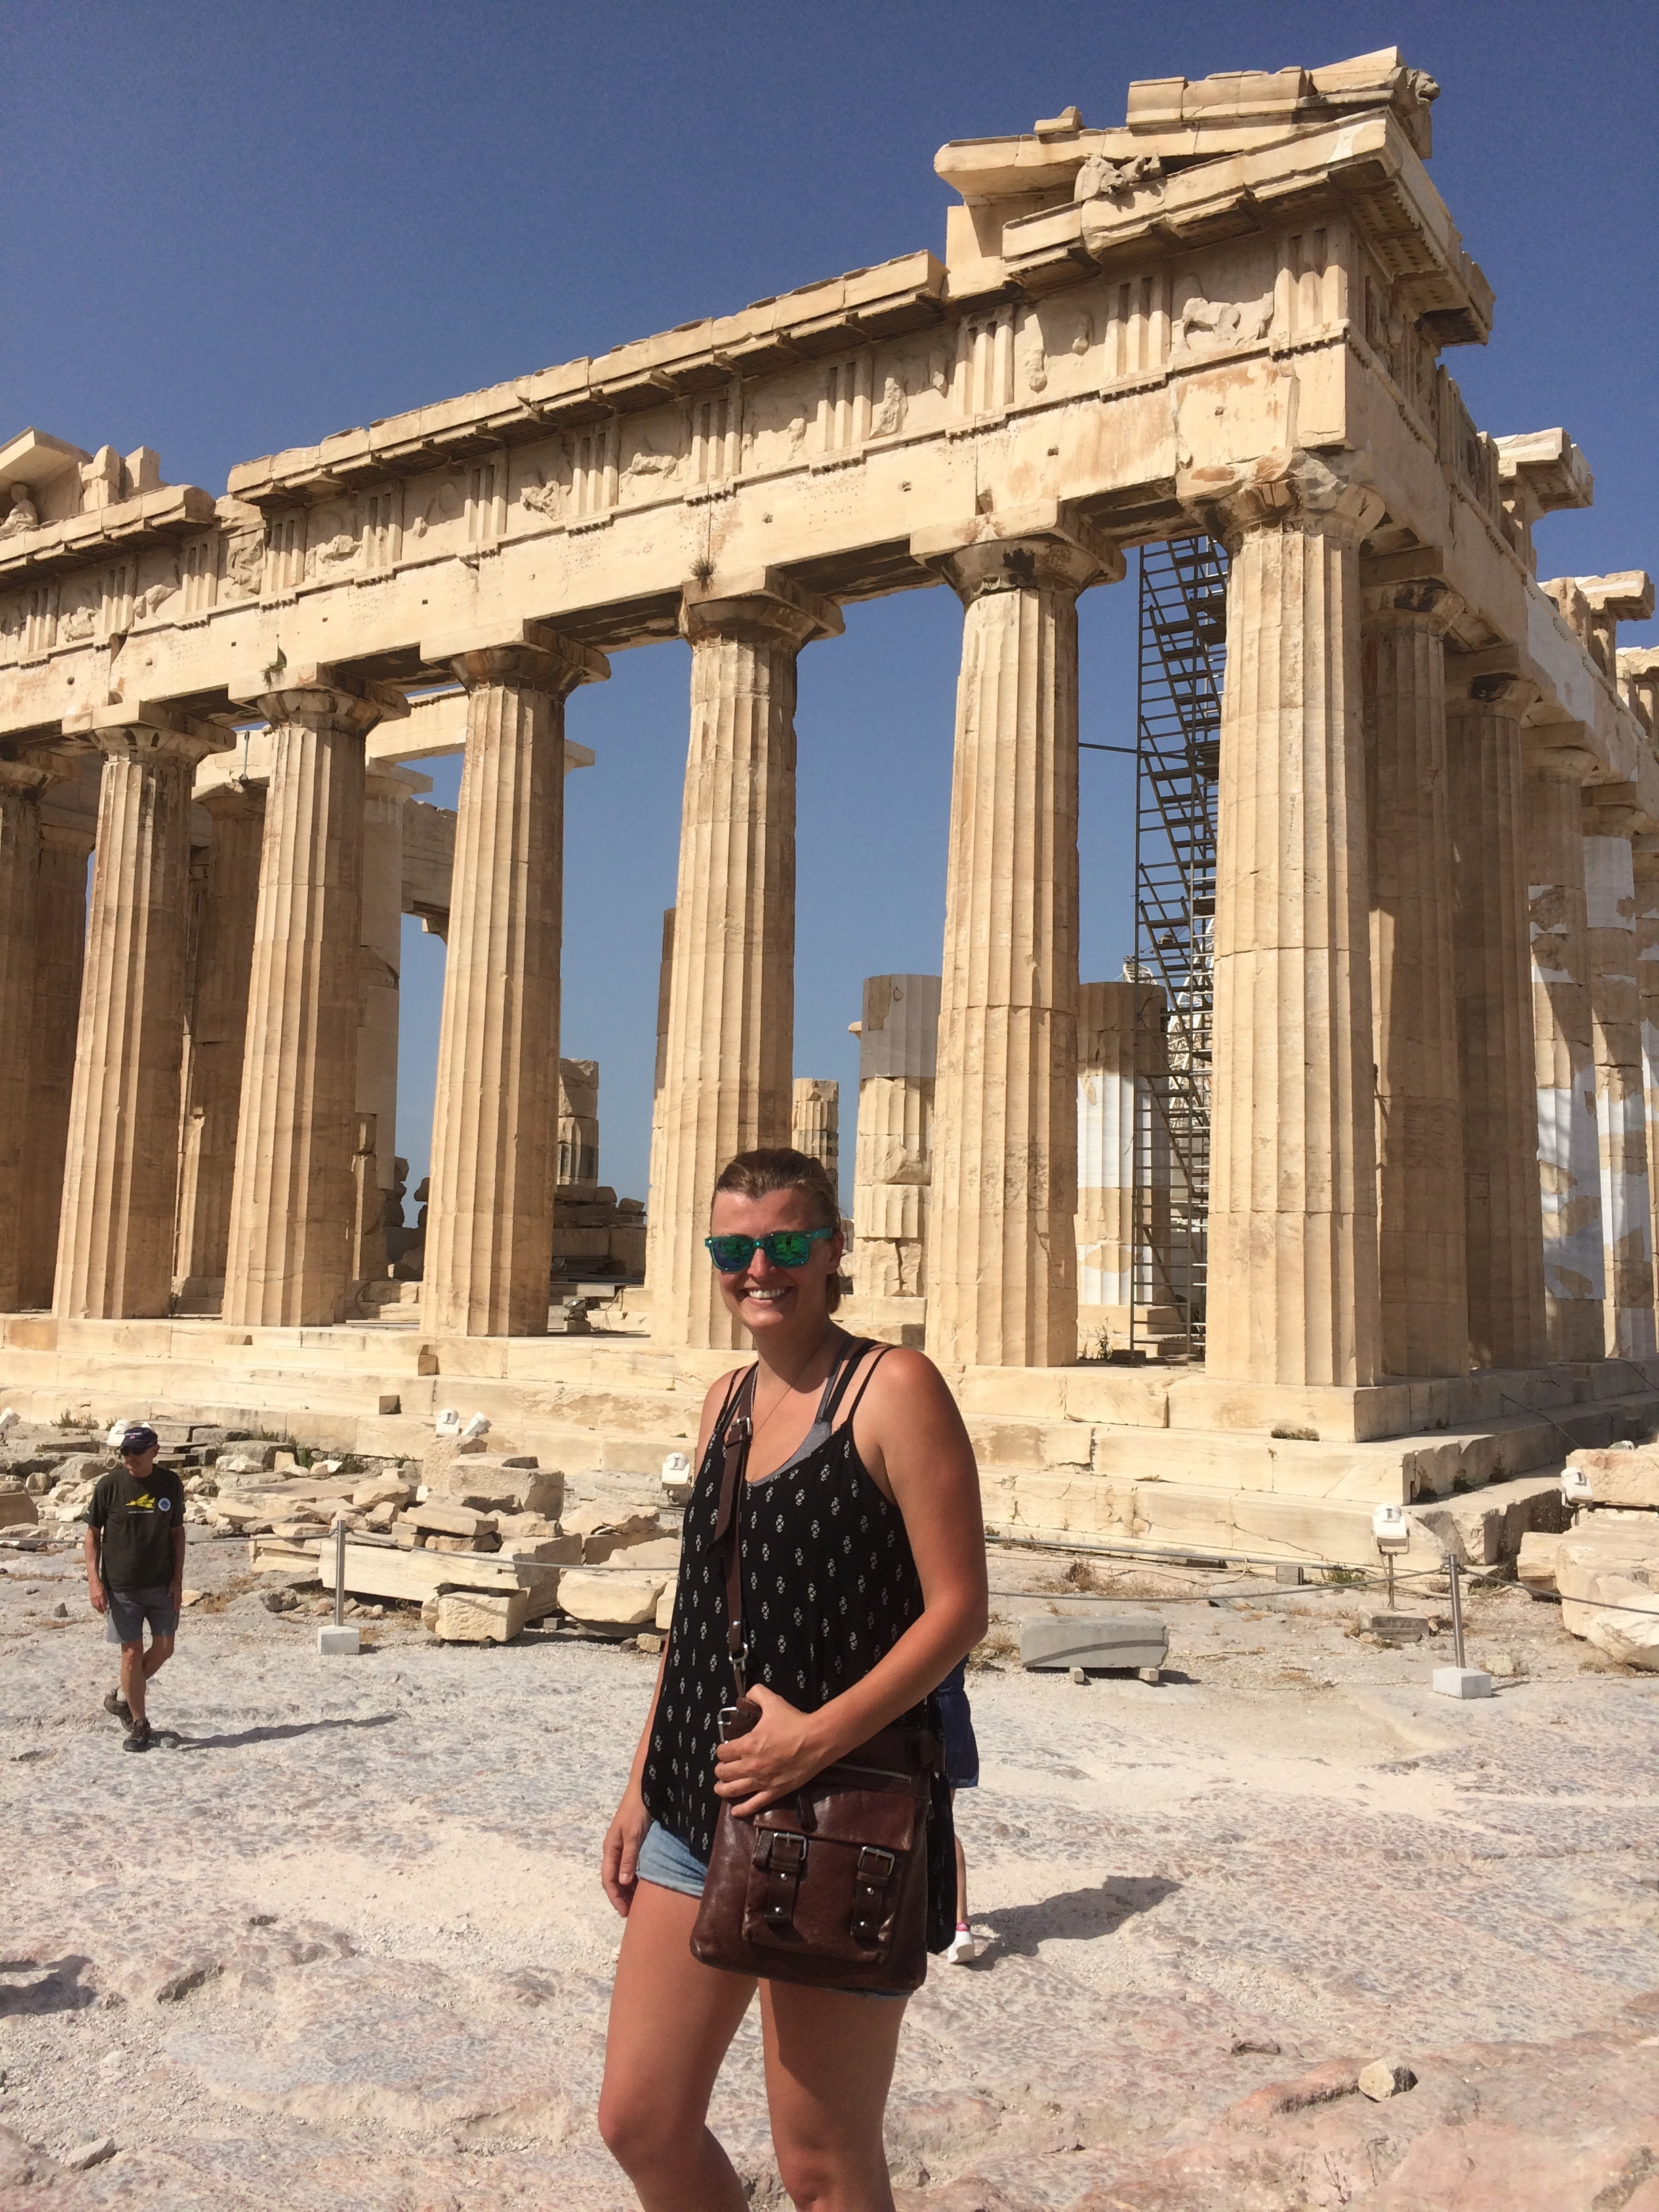 View of Sara at Pantheon, Acropolis, Athens, Greece, The World